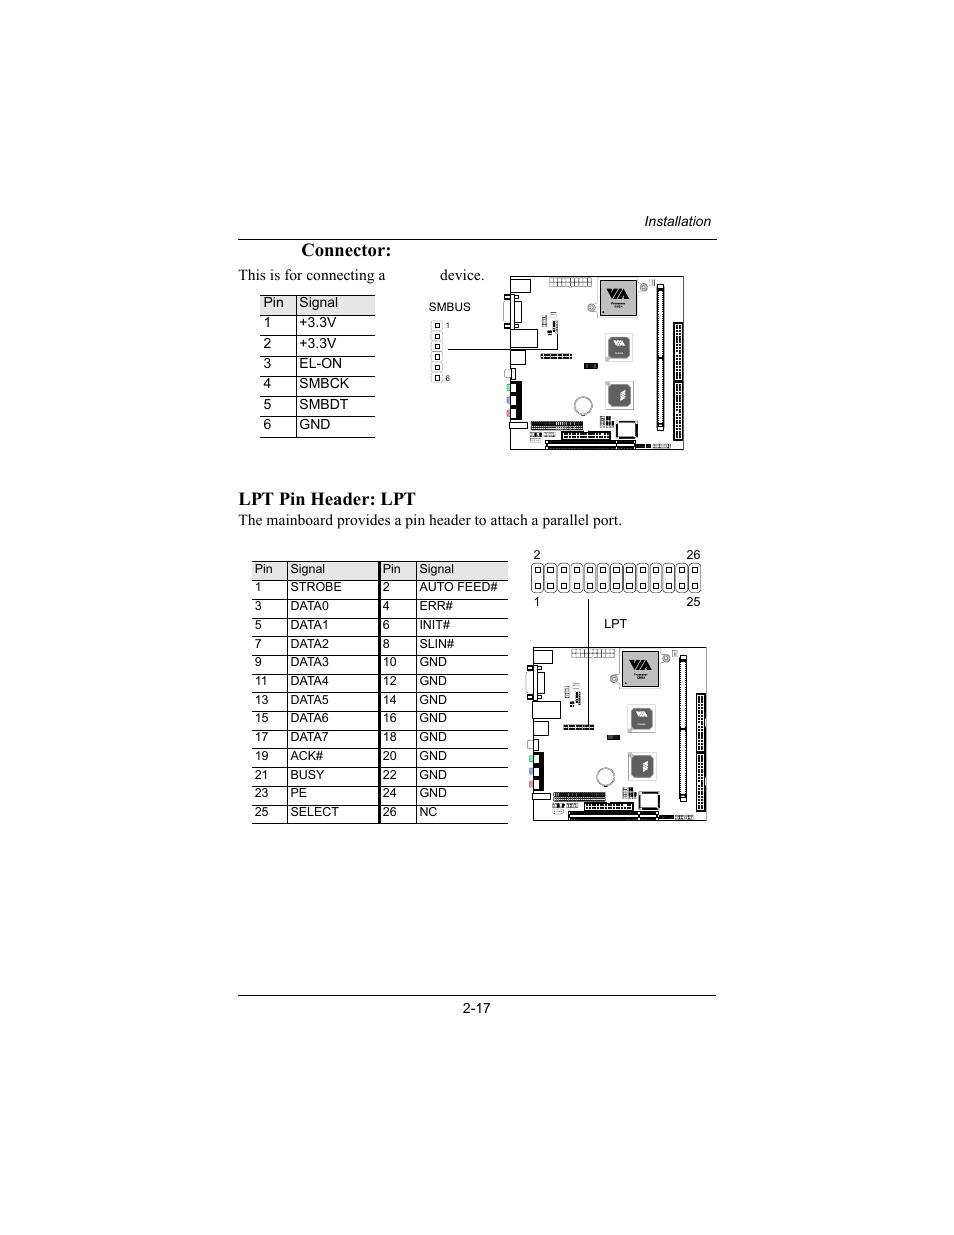 Smbus Connector Lpt Pin Header Philips Mini Itx Atx 24 Wiring Diagram Mainboard Epia Mii User Manual Page 32 75